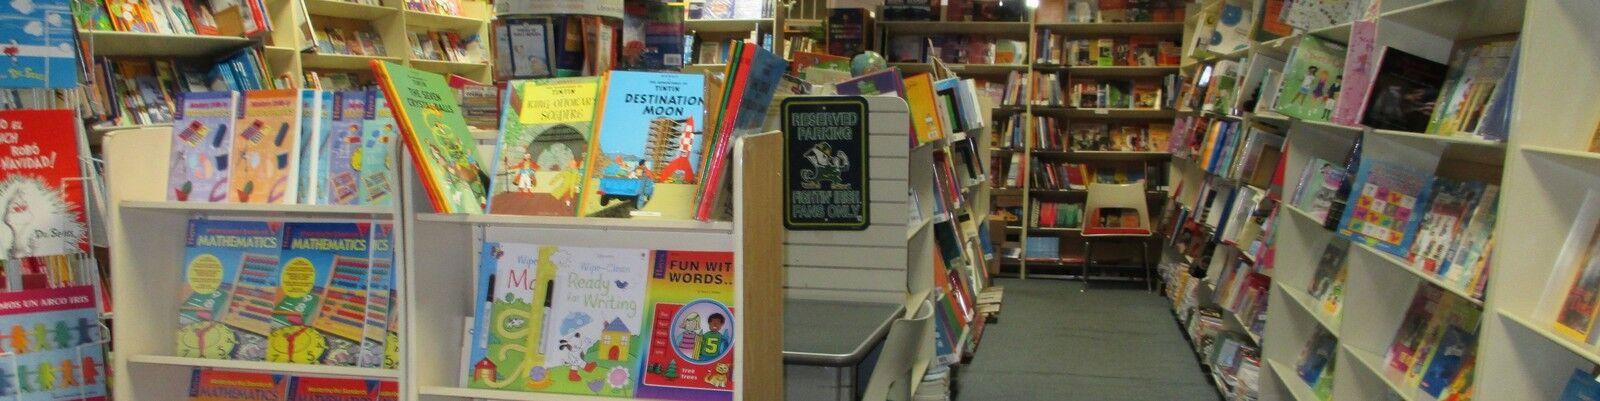 La Gran Macarena Books